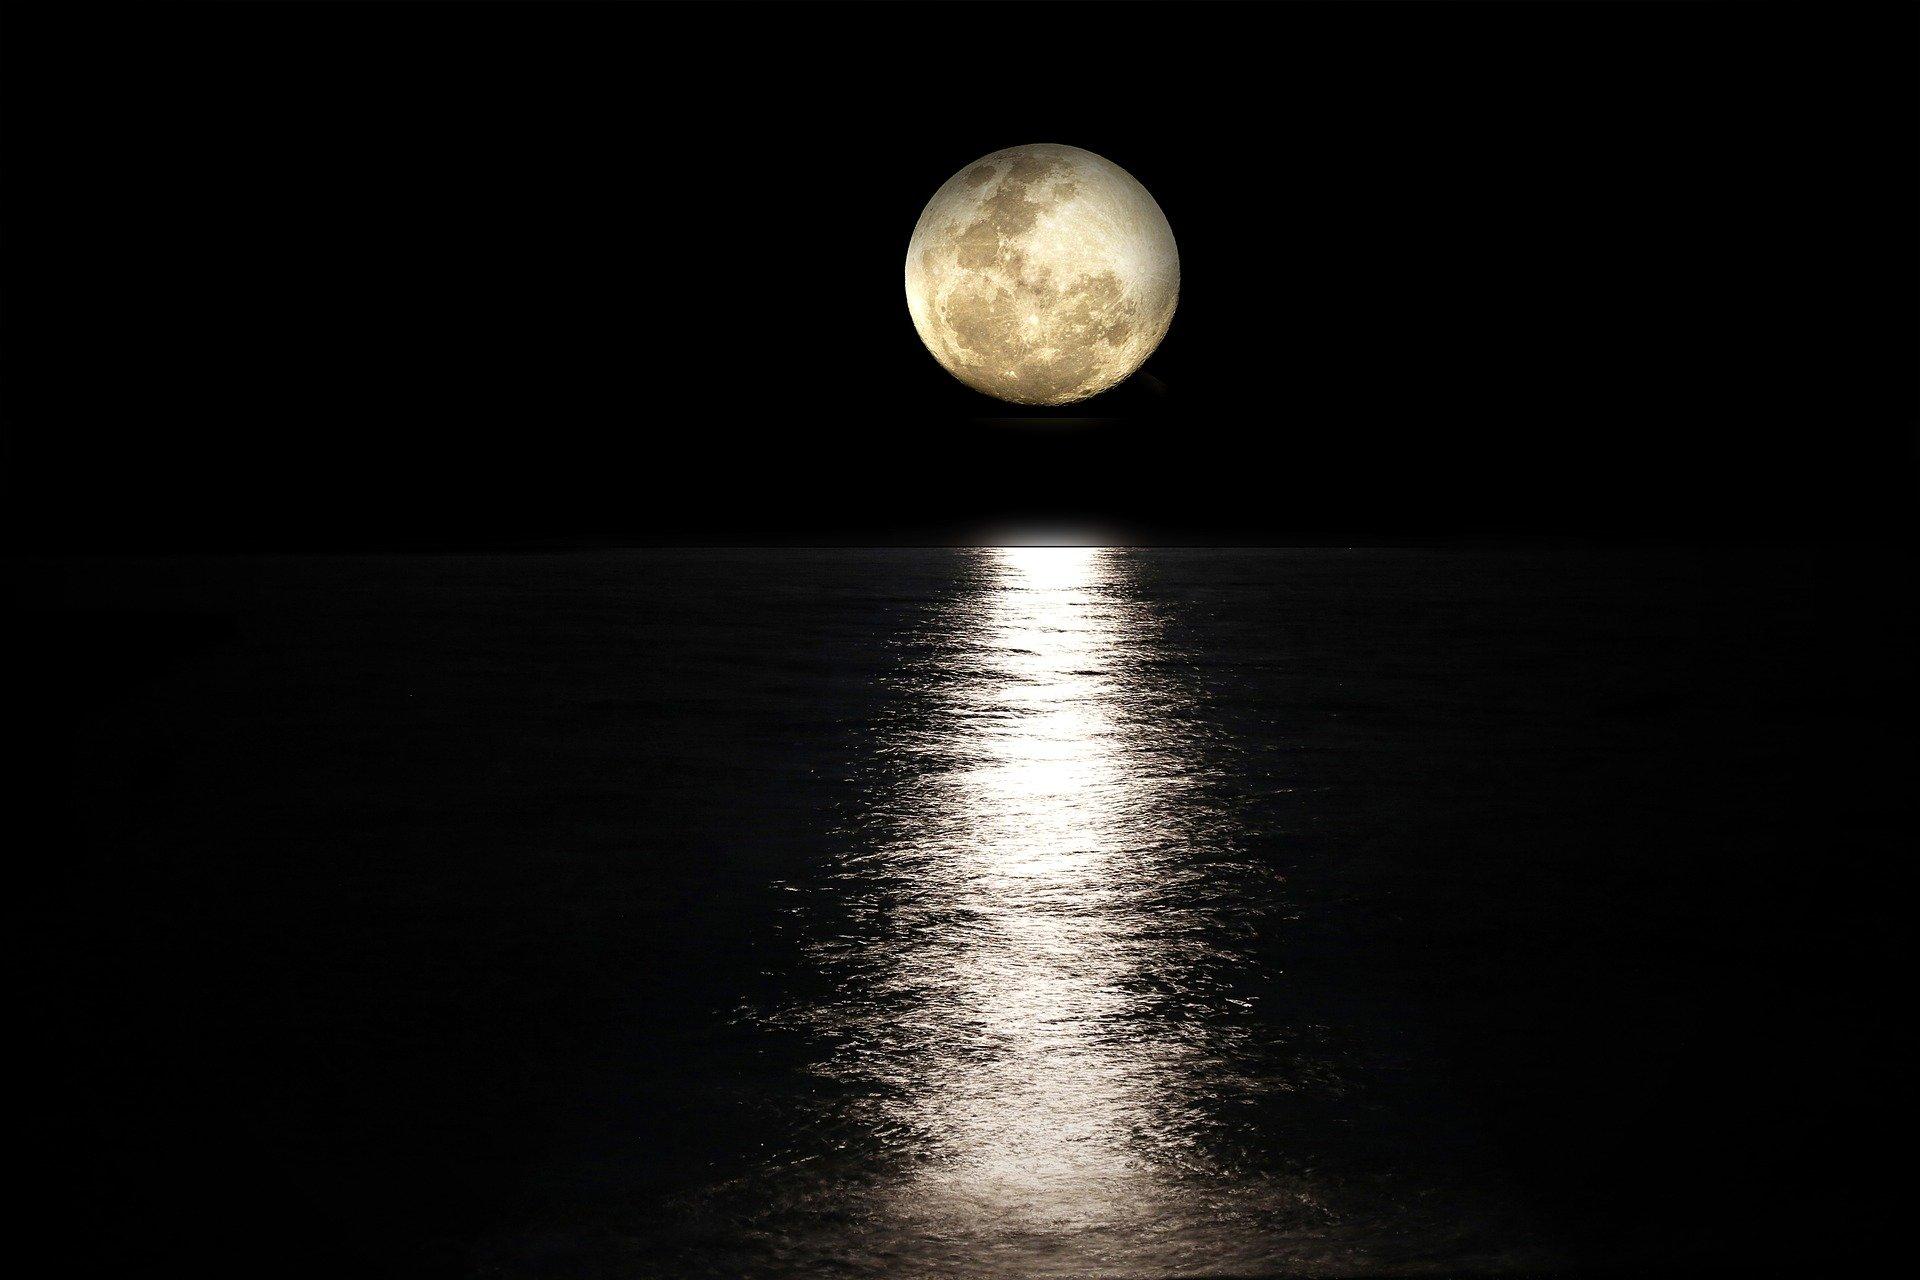 You are currently viewing Luna Piena in Acquario, guarigione della parte fragile.